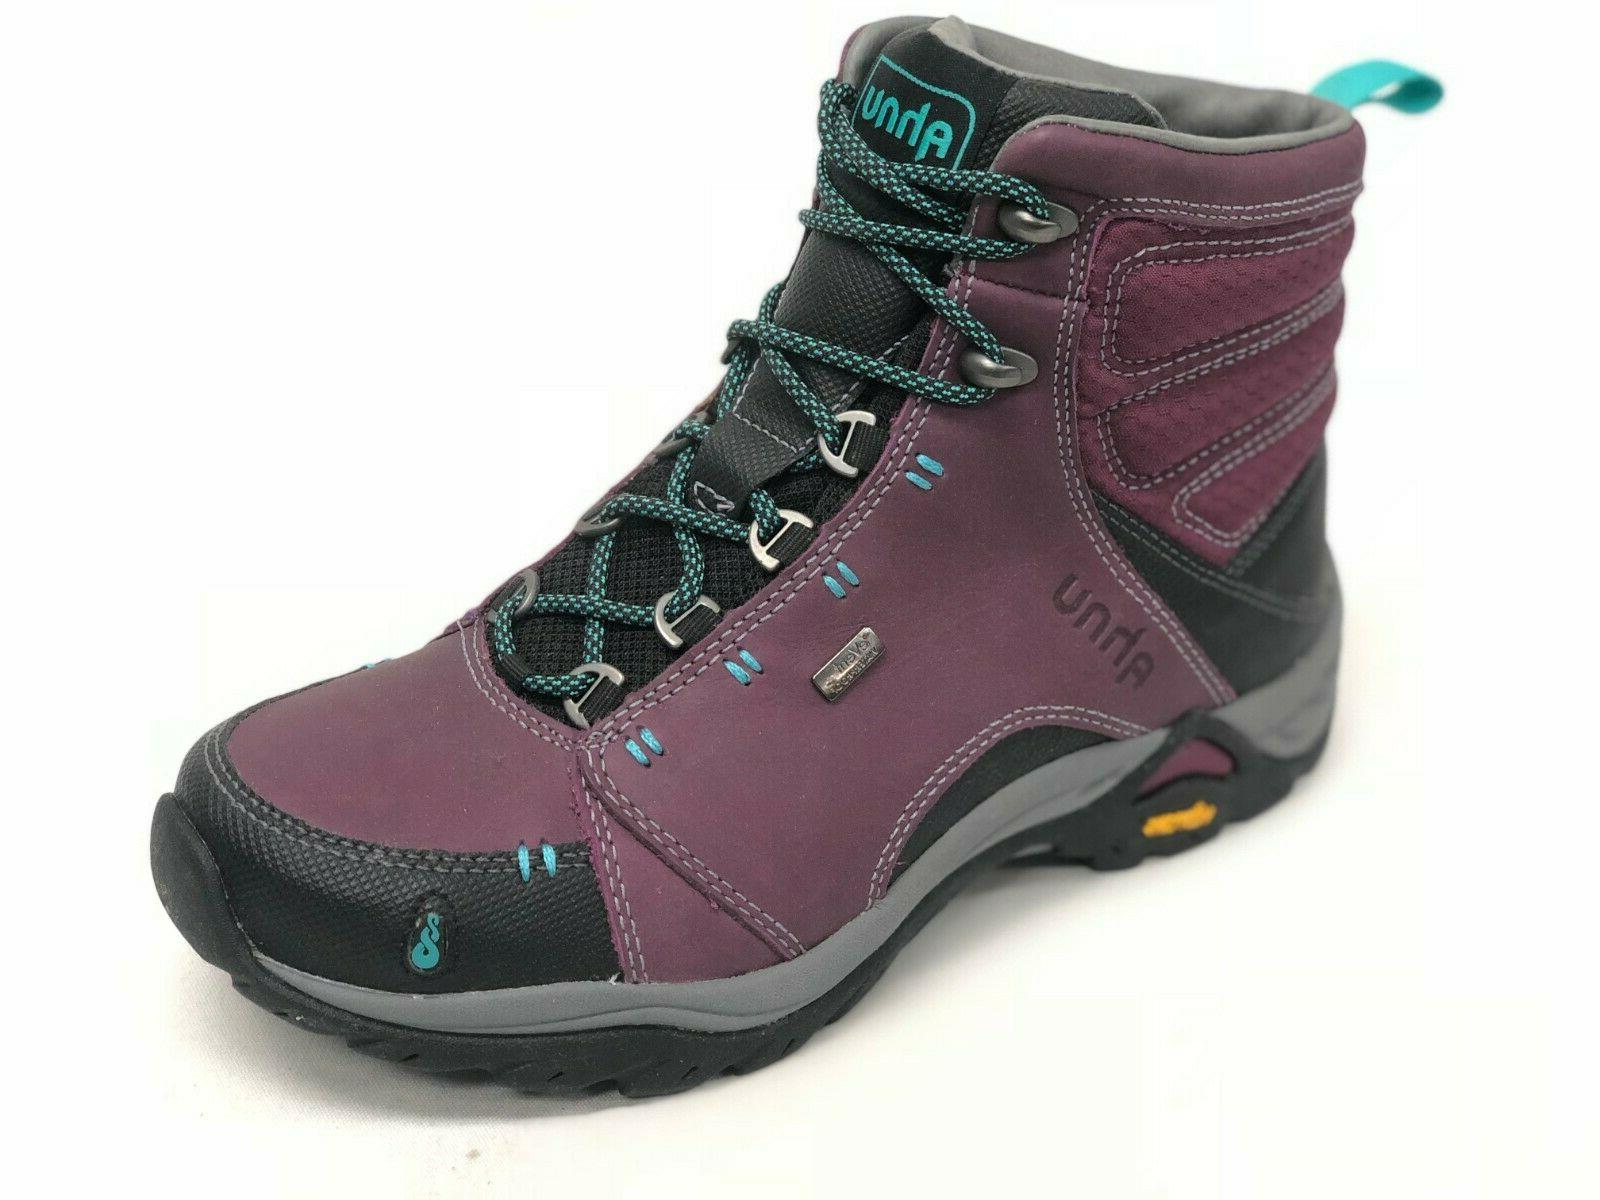 Ahnu Women's Montara Hiking Boots Waterproof Leather Magenta